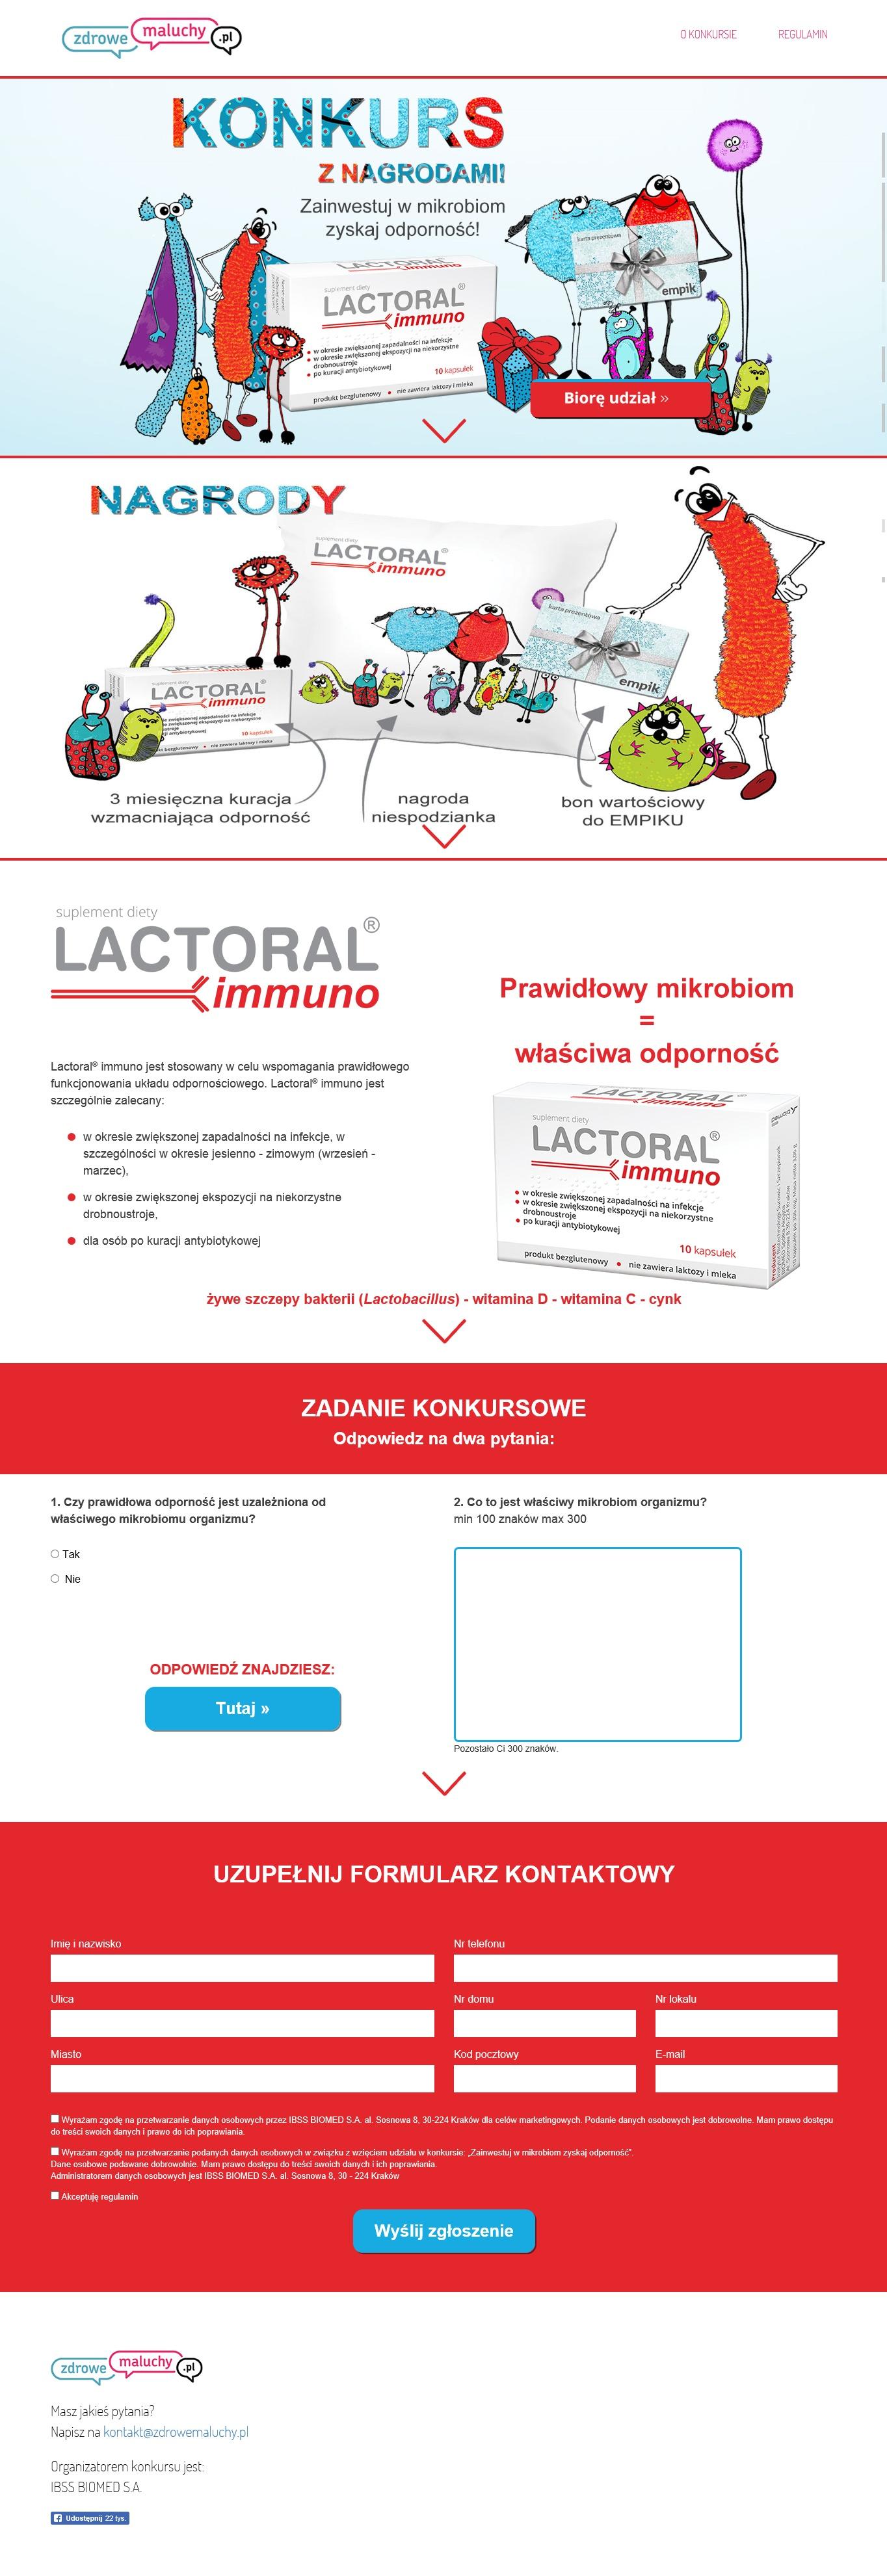 Klient Biomed - landing page konkursowy Lactoral immuno